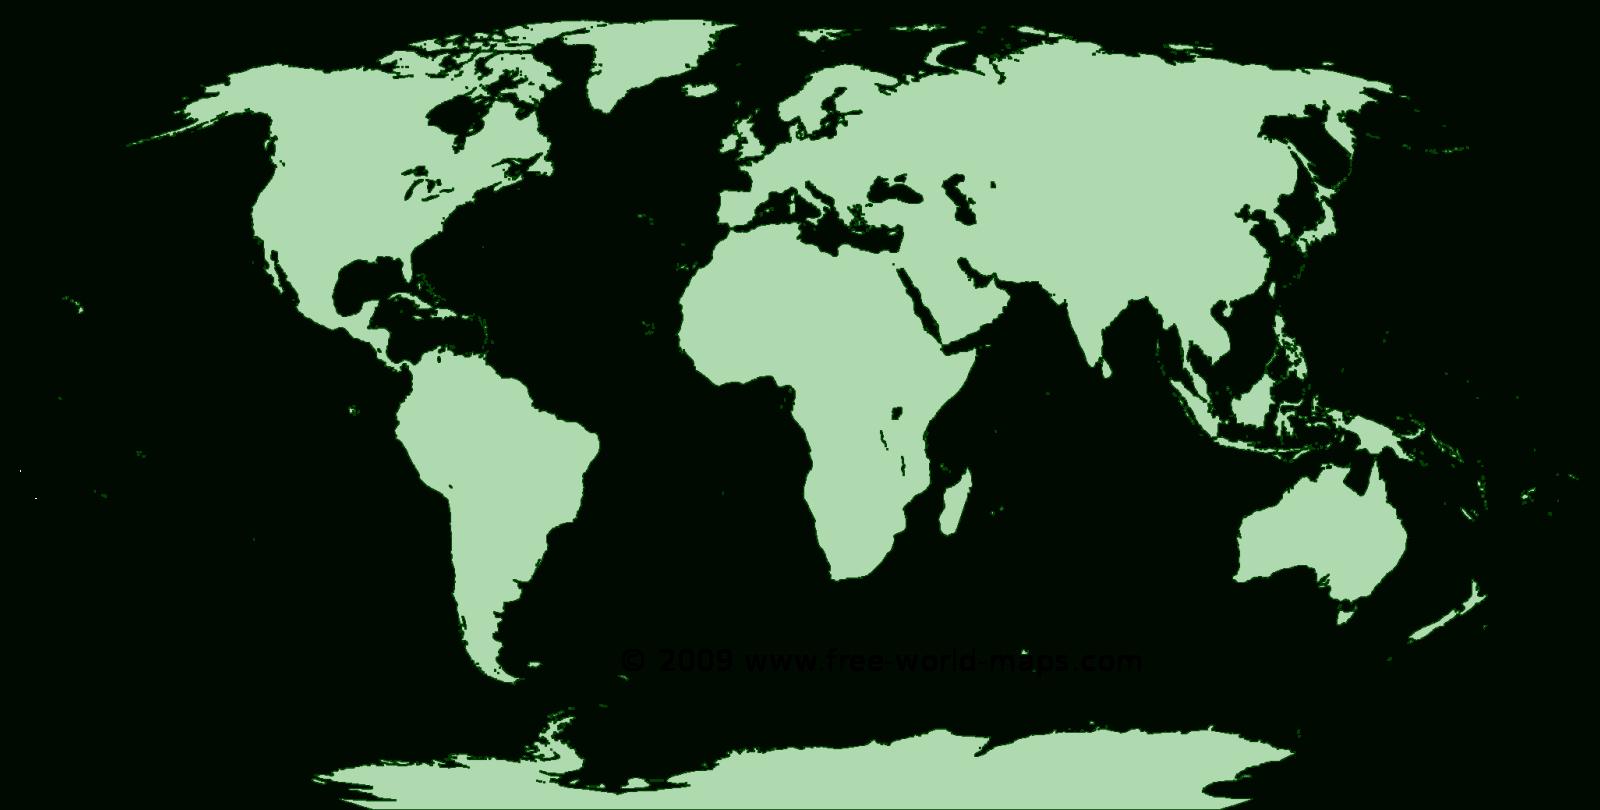 Printable Blank World Maps   Free World Maps - Free Printable World Map Images